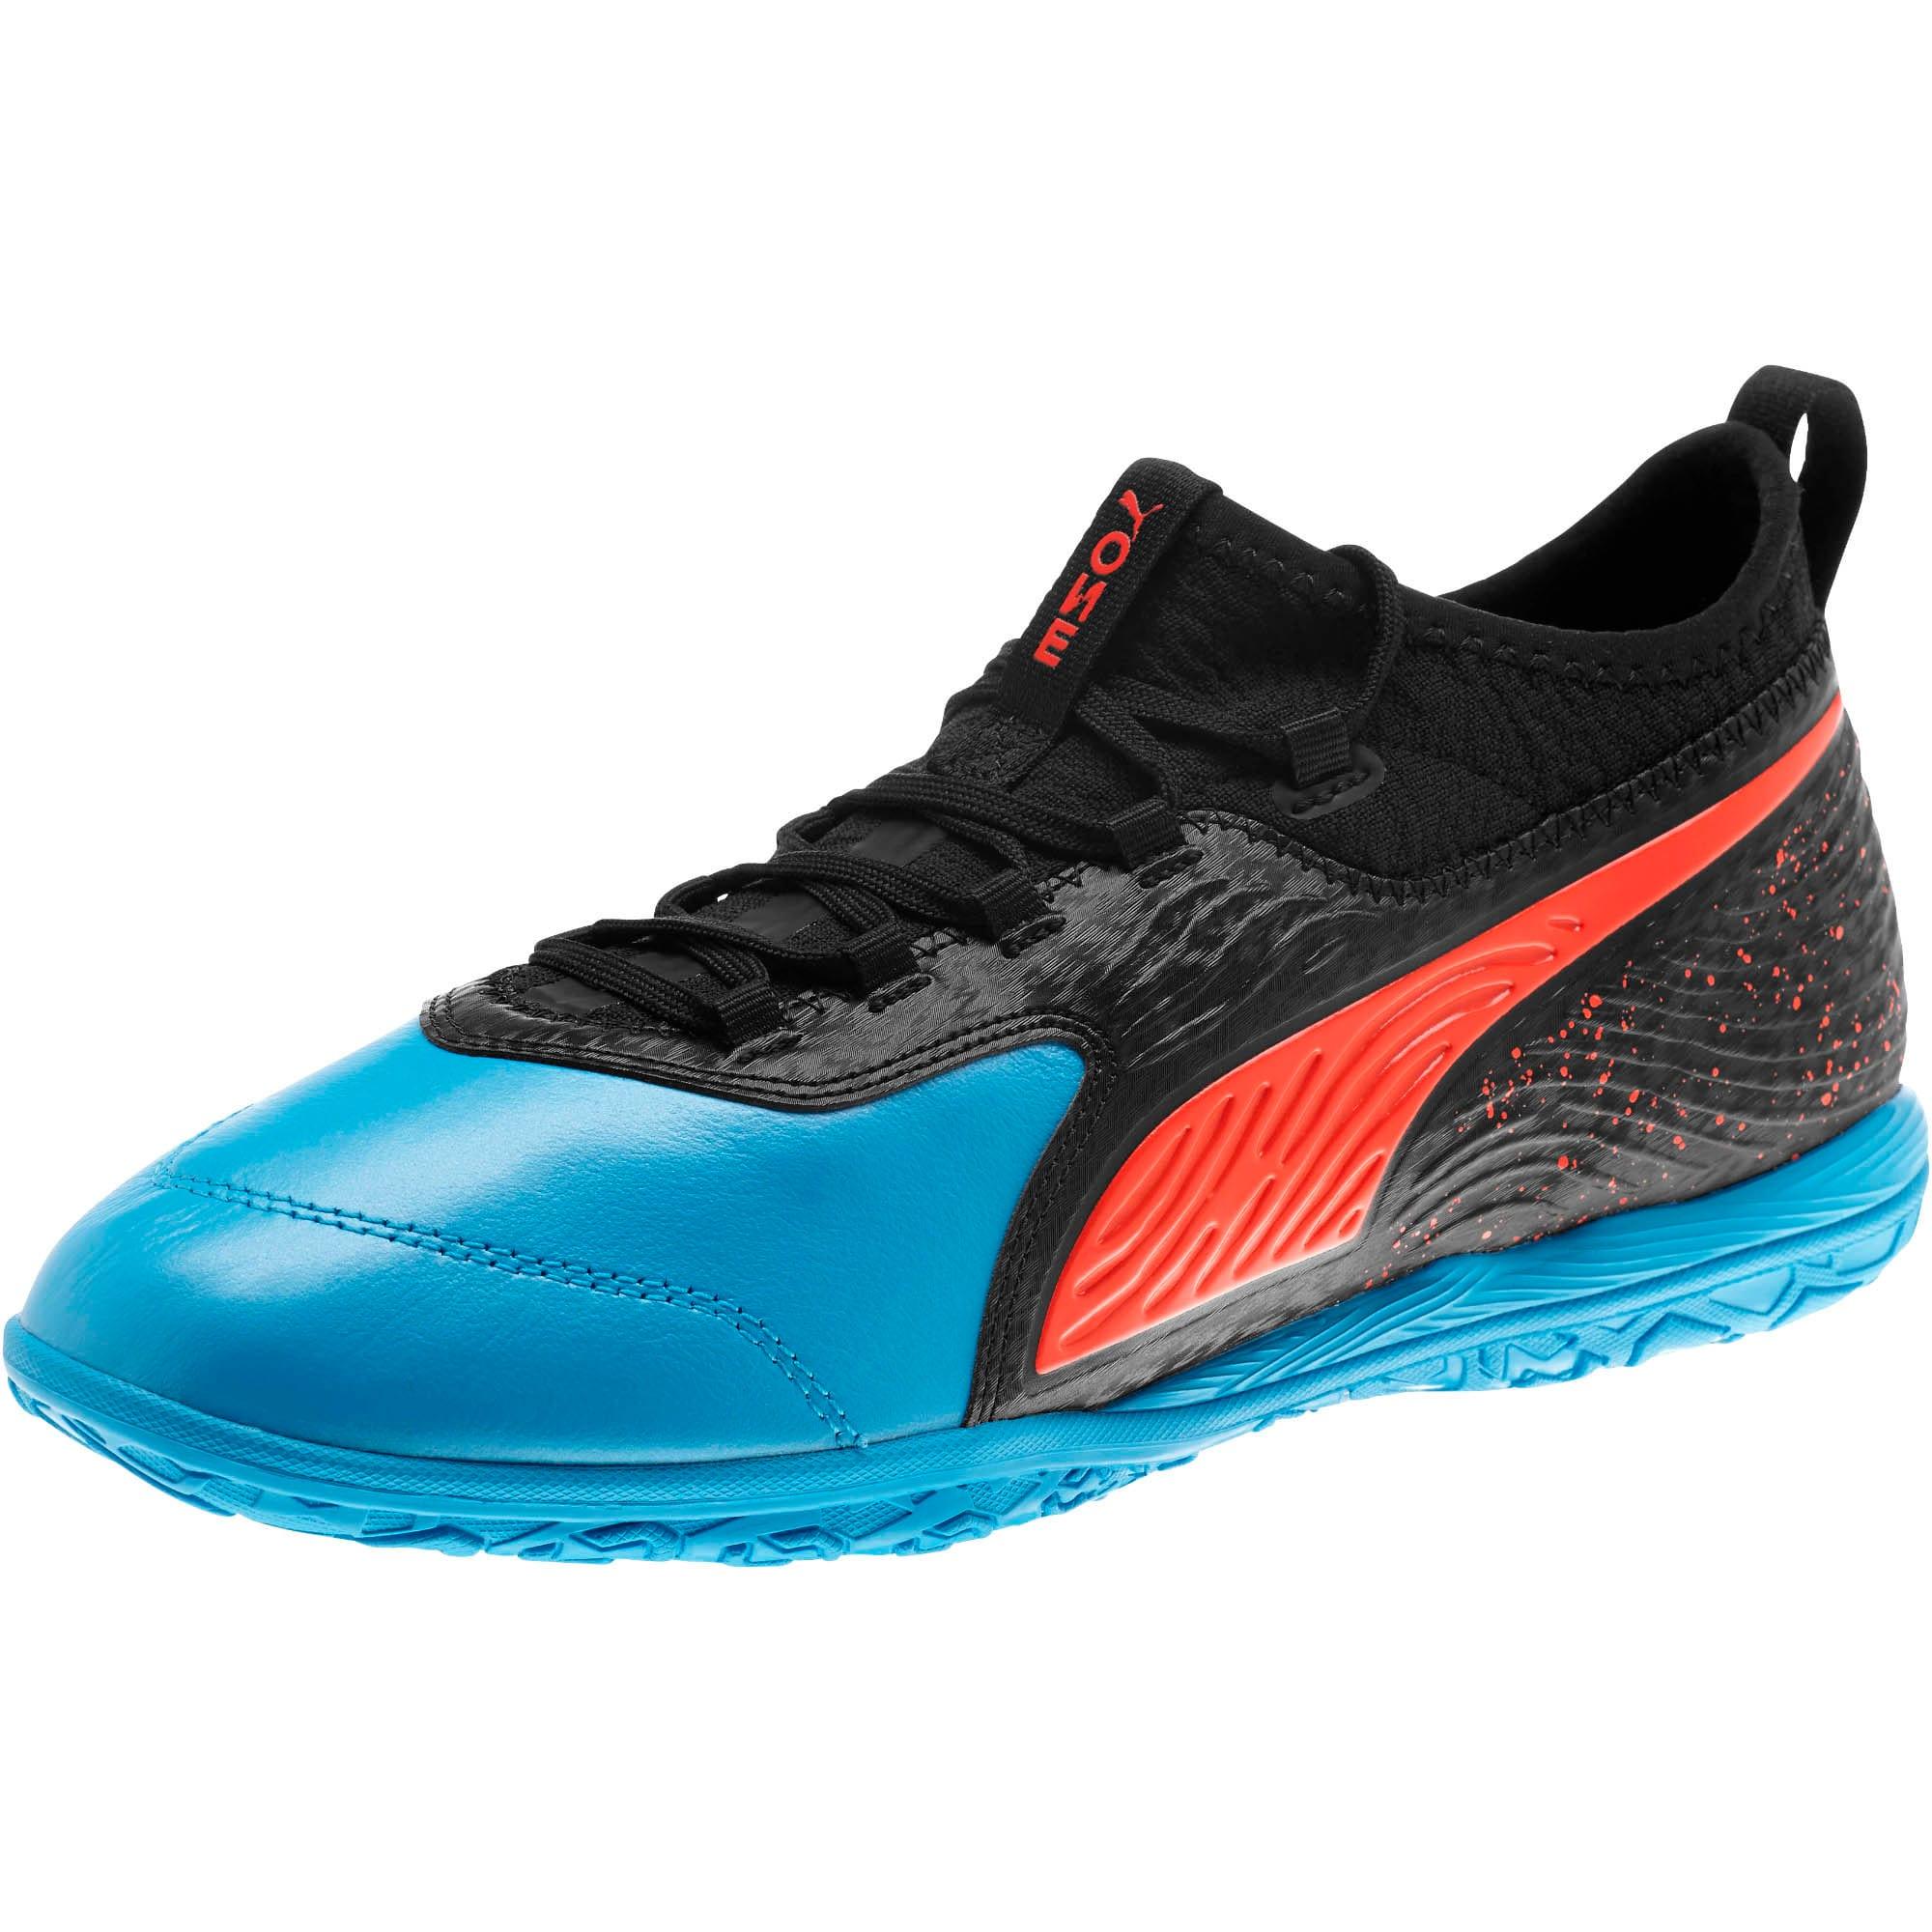 Thumbnail 1 of PUMA ONE 19.3 IT Men's Soccer Shoes, Bleu Azur-Red Blast-Black, medium